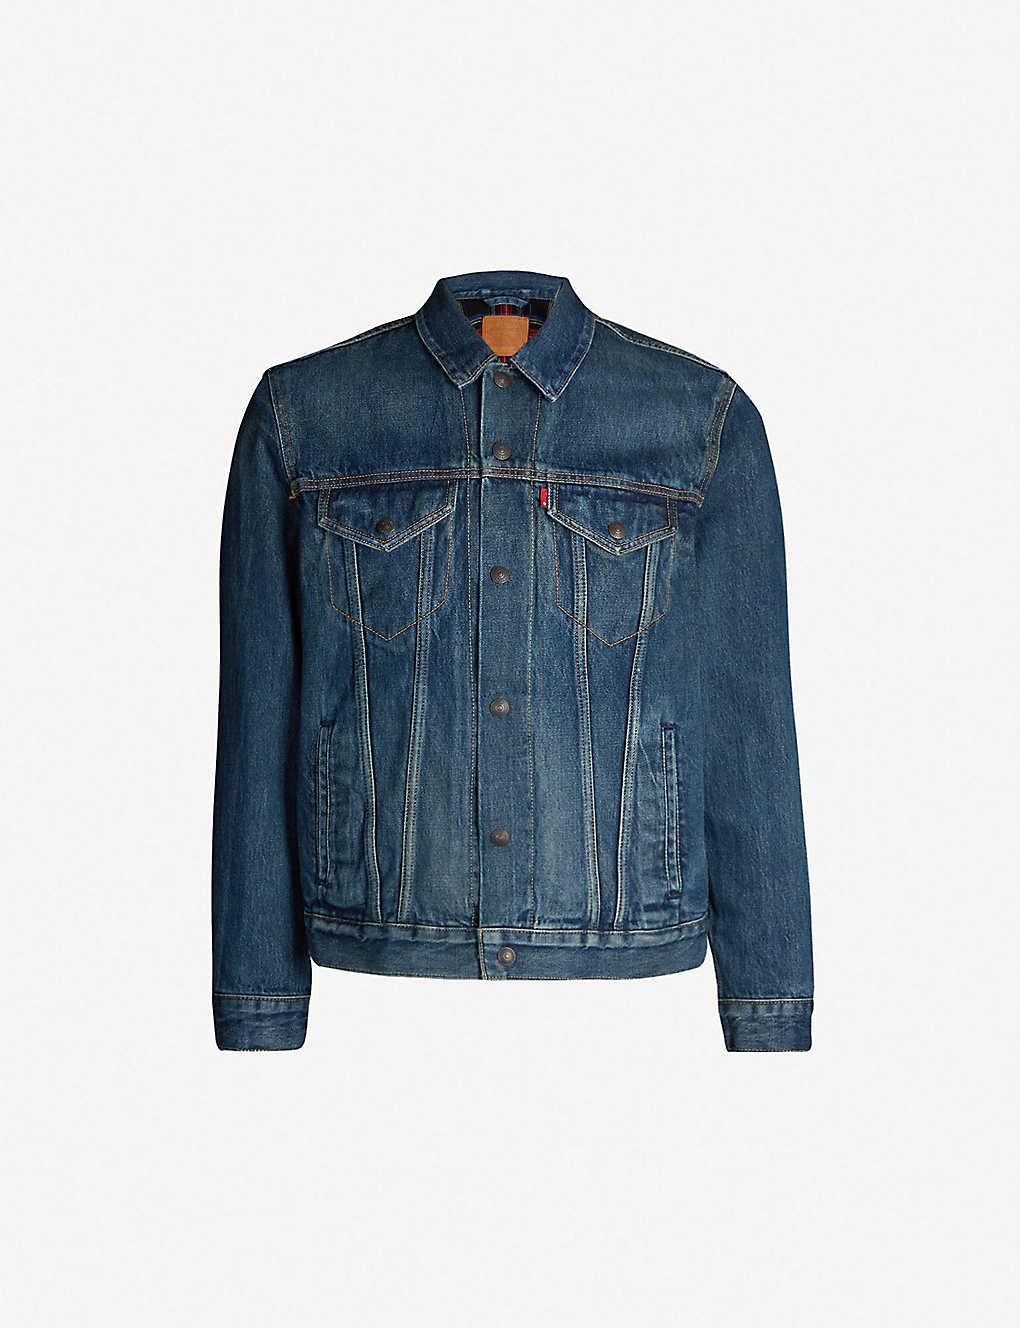 a2323a58fdb43 Flannel-lined denim trucker jacket - Chewy ...